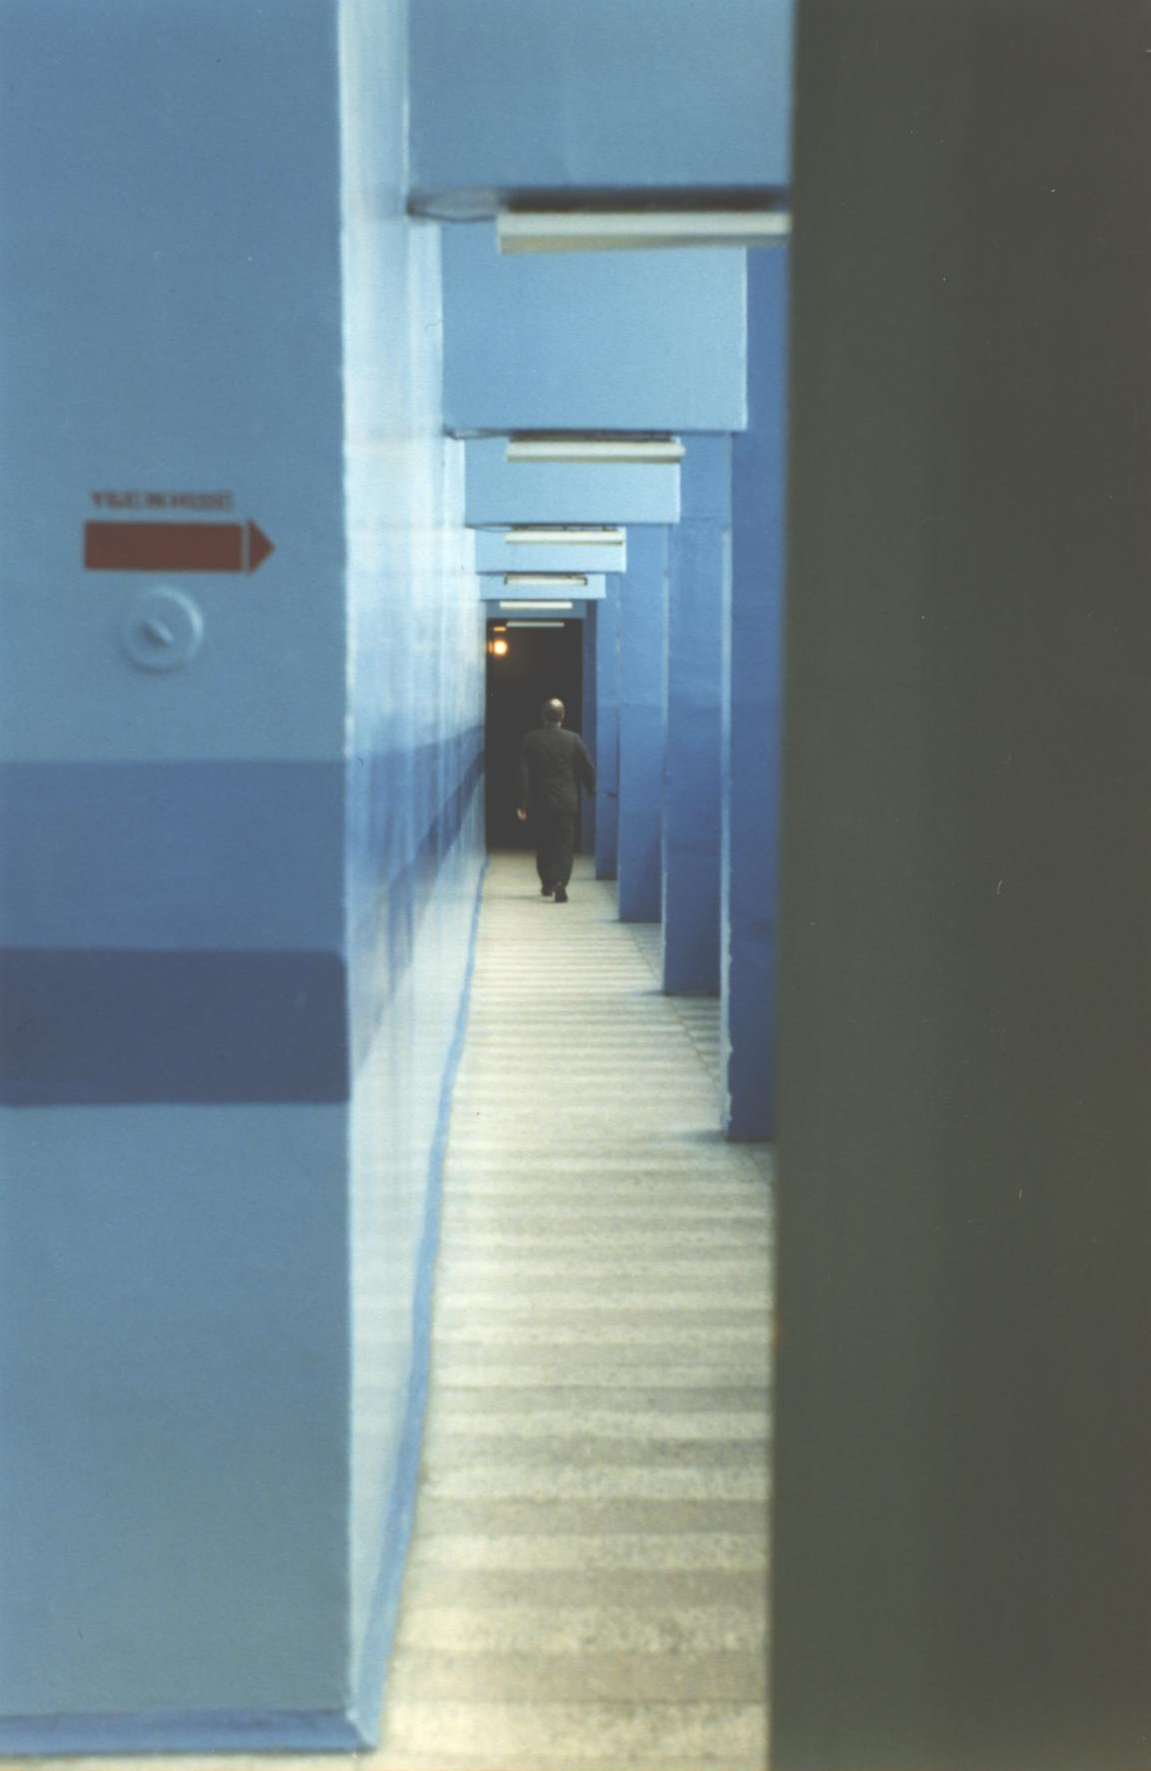 Corridor at the Kola Nuclear Power Plant. (JAMES FLINT)